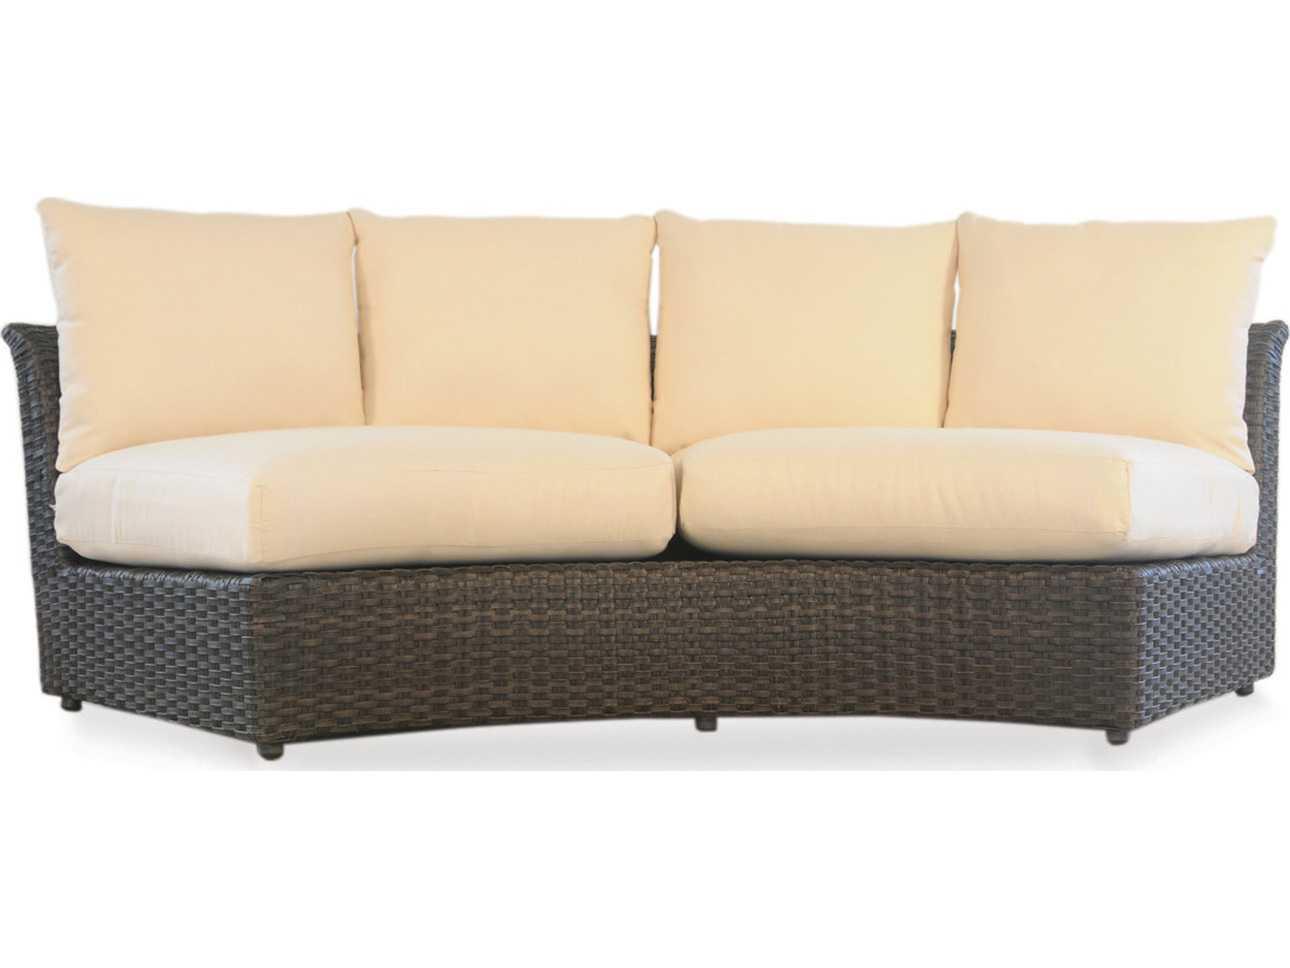 Lloyd Flanders Flair Wicker Curved Sectional Sofa 215056